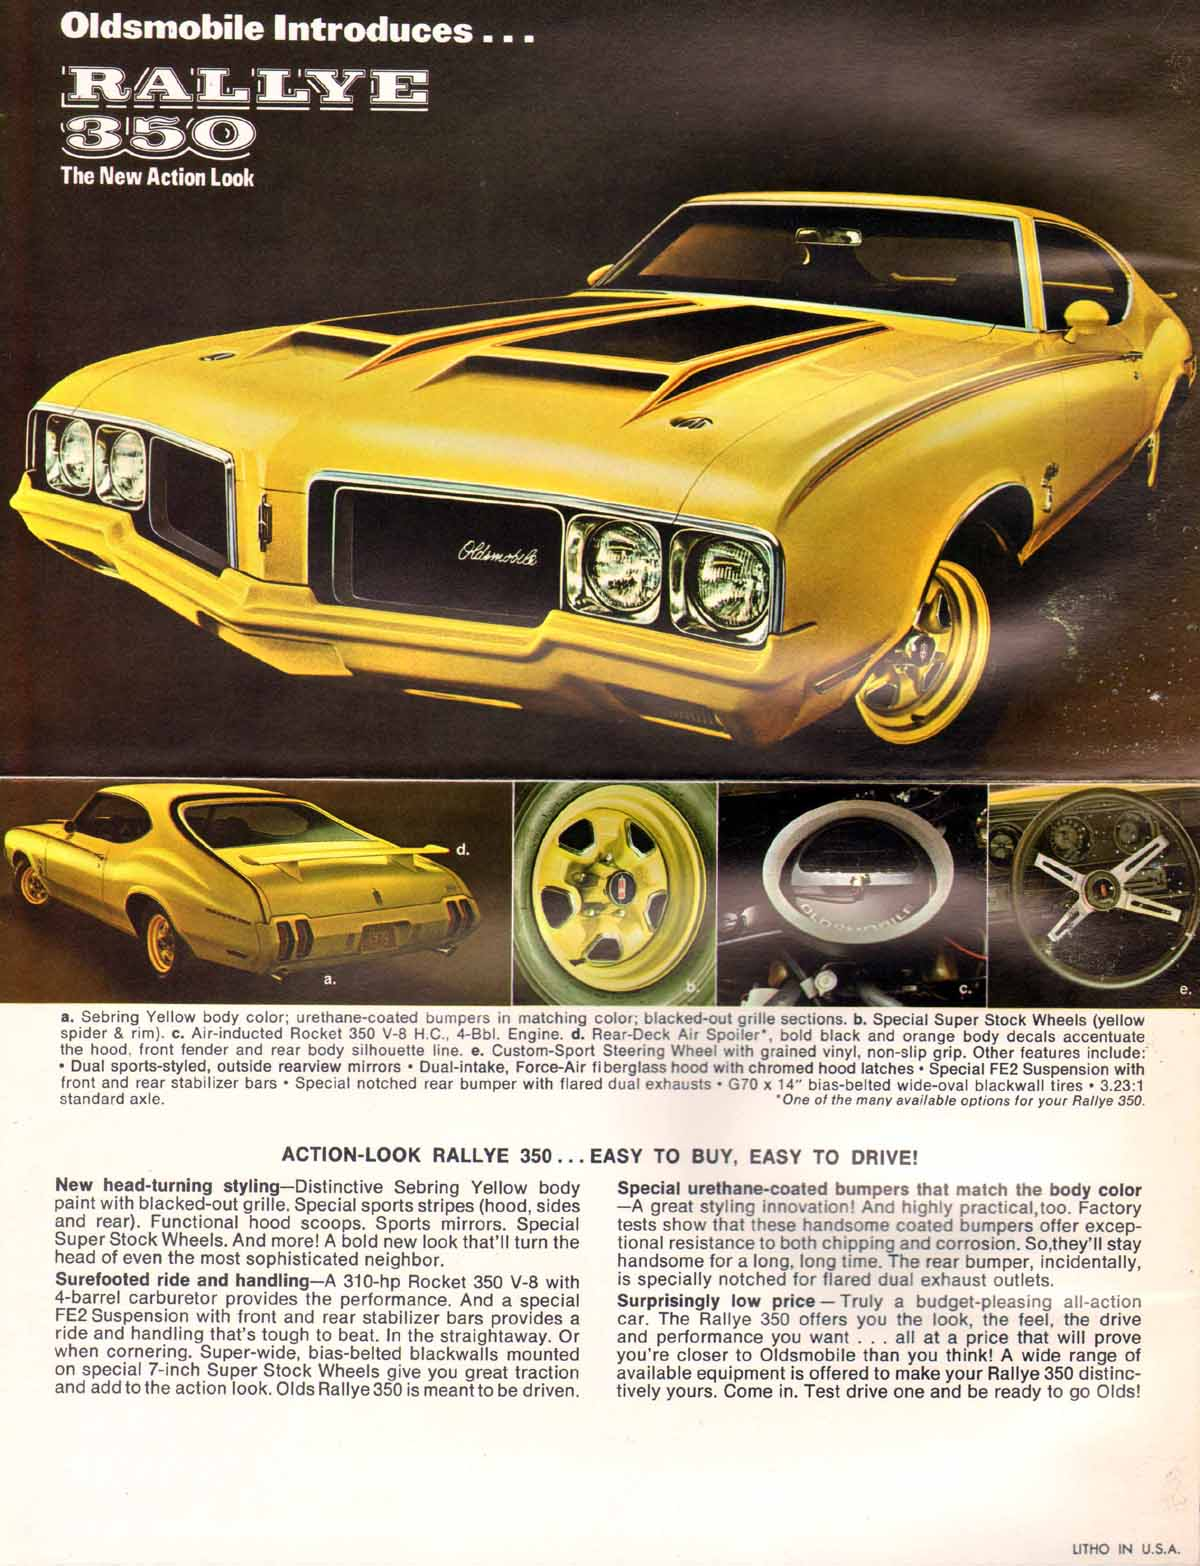 [Image: 1970%20Oldsmobile%20Rallye%20350%20Folder-02-03.jpg]